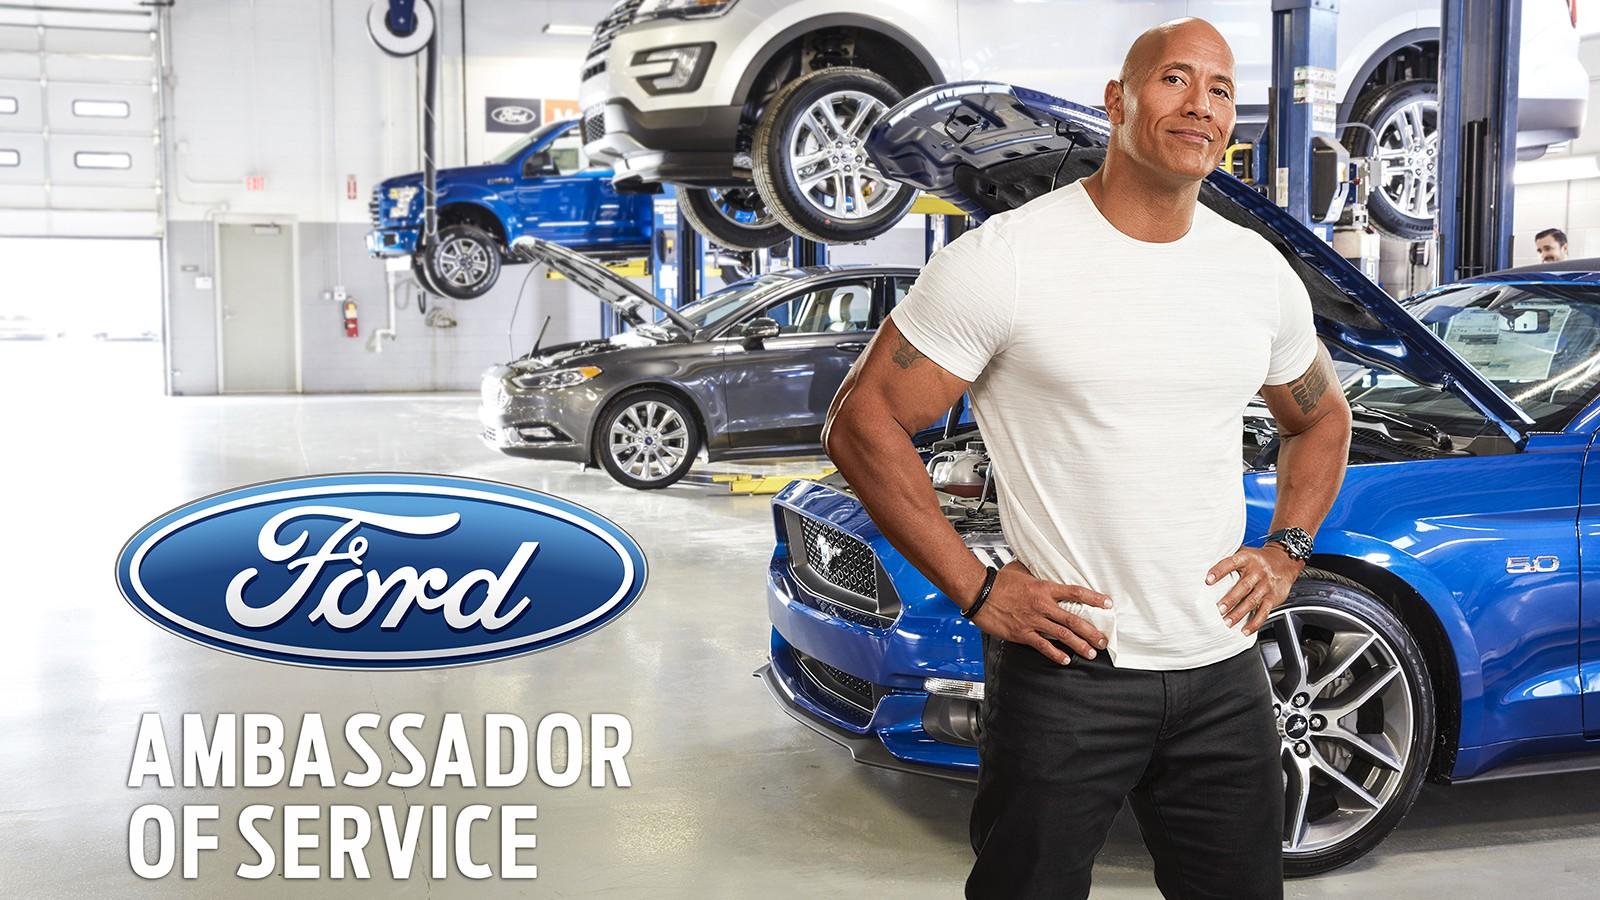 Dwayne Johnson — Ford Ambassador of Service